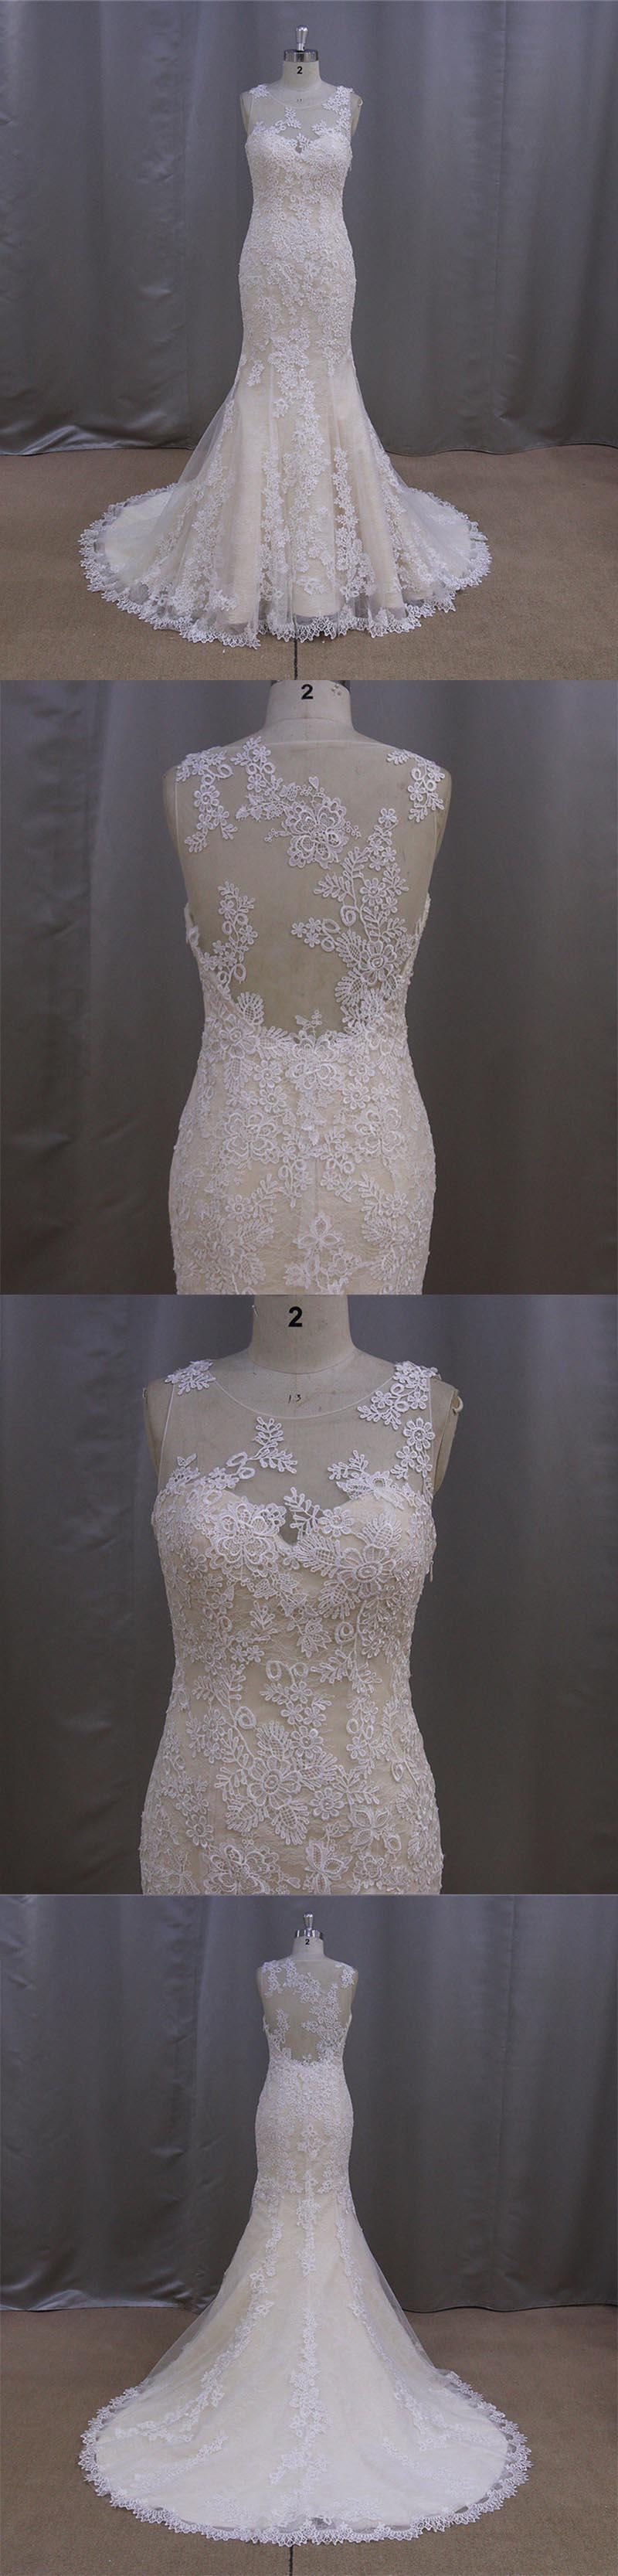 Gorgeous Dropped Lace Wedding Dress Patterns